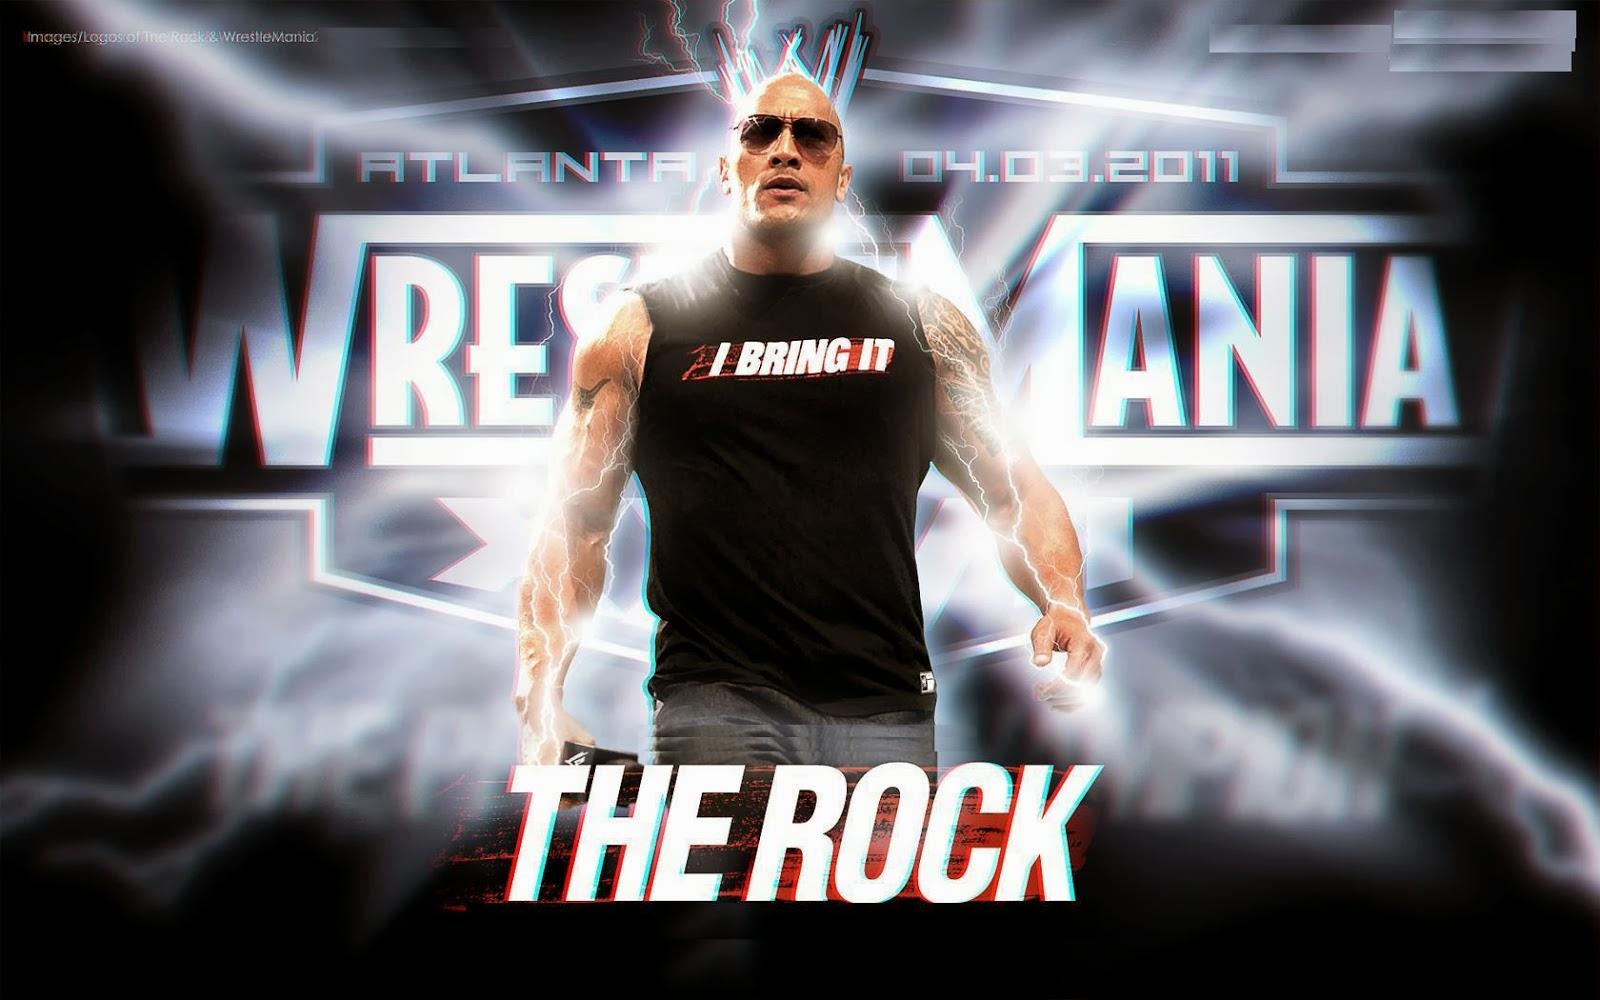 The Rock Hd Wallpapers Free Download | WWE HD WALLPAPER ...